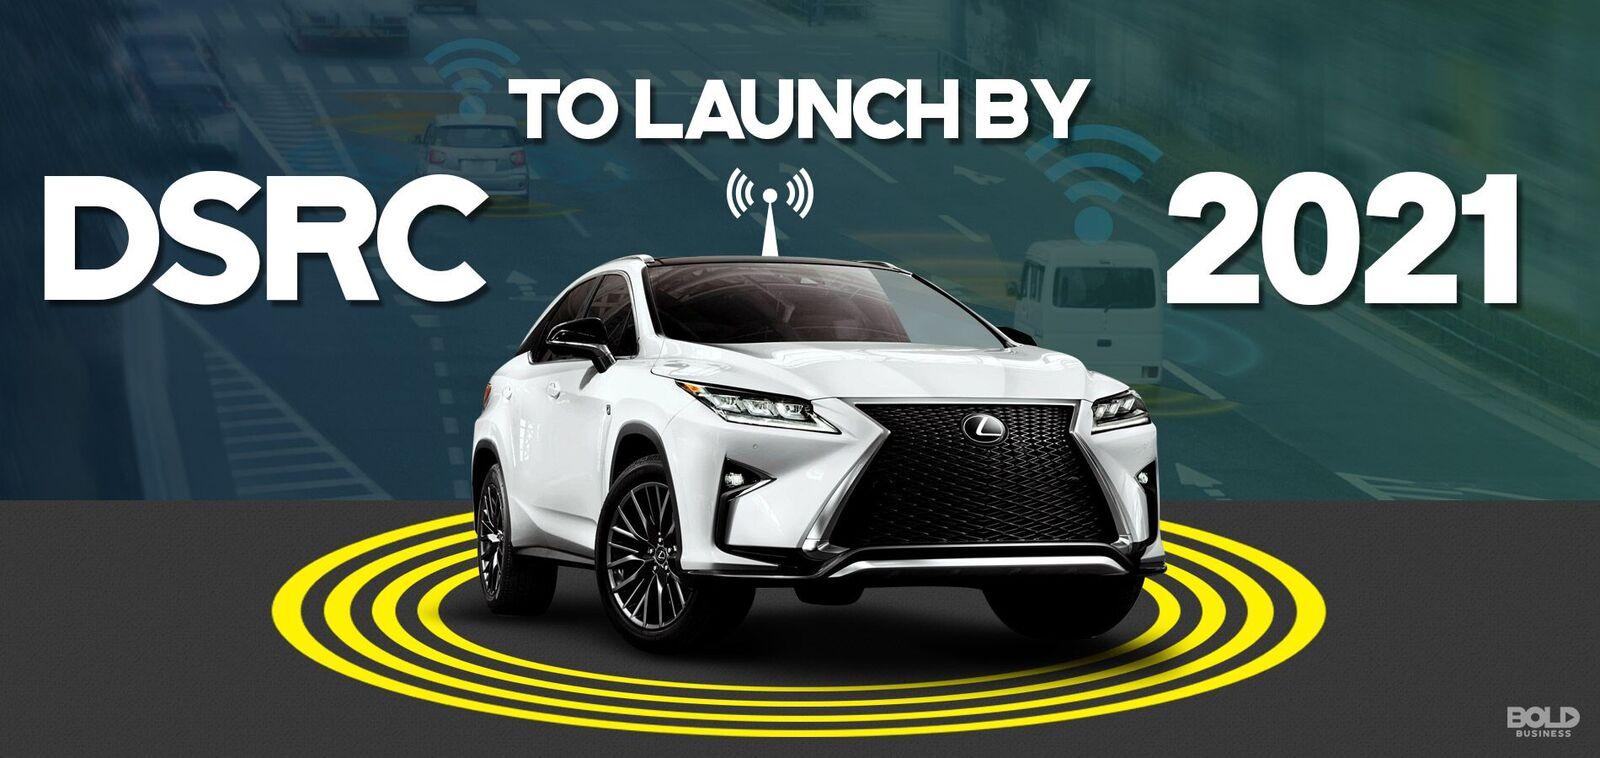 autonomous car equipped with dsrc